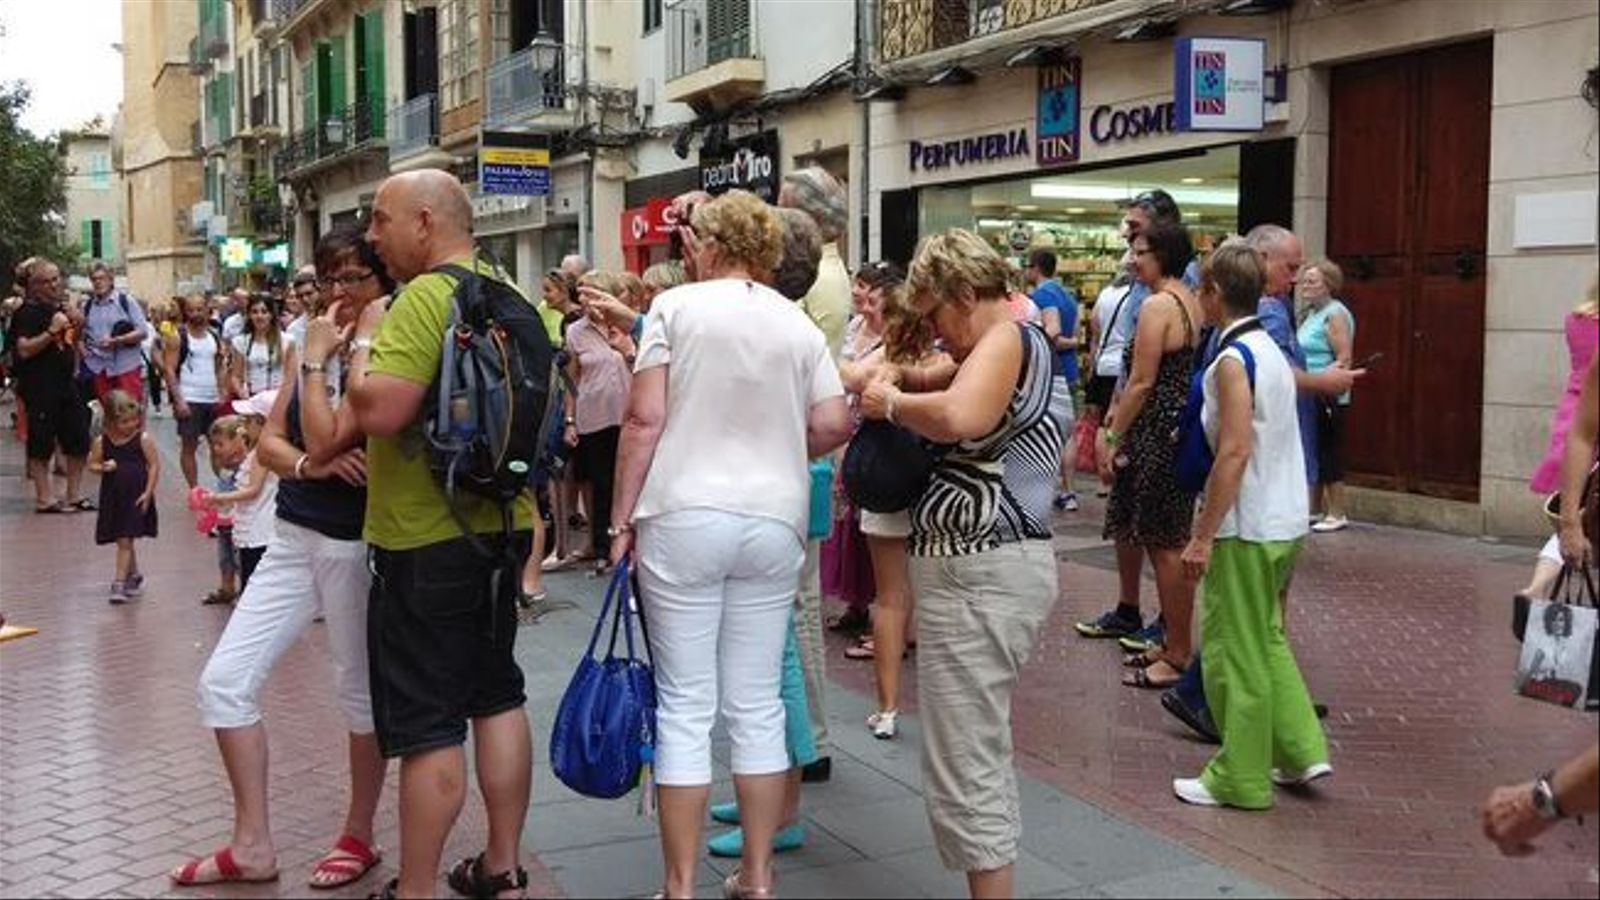 Turistes al carrer Sant Miquel de Palma.